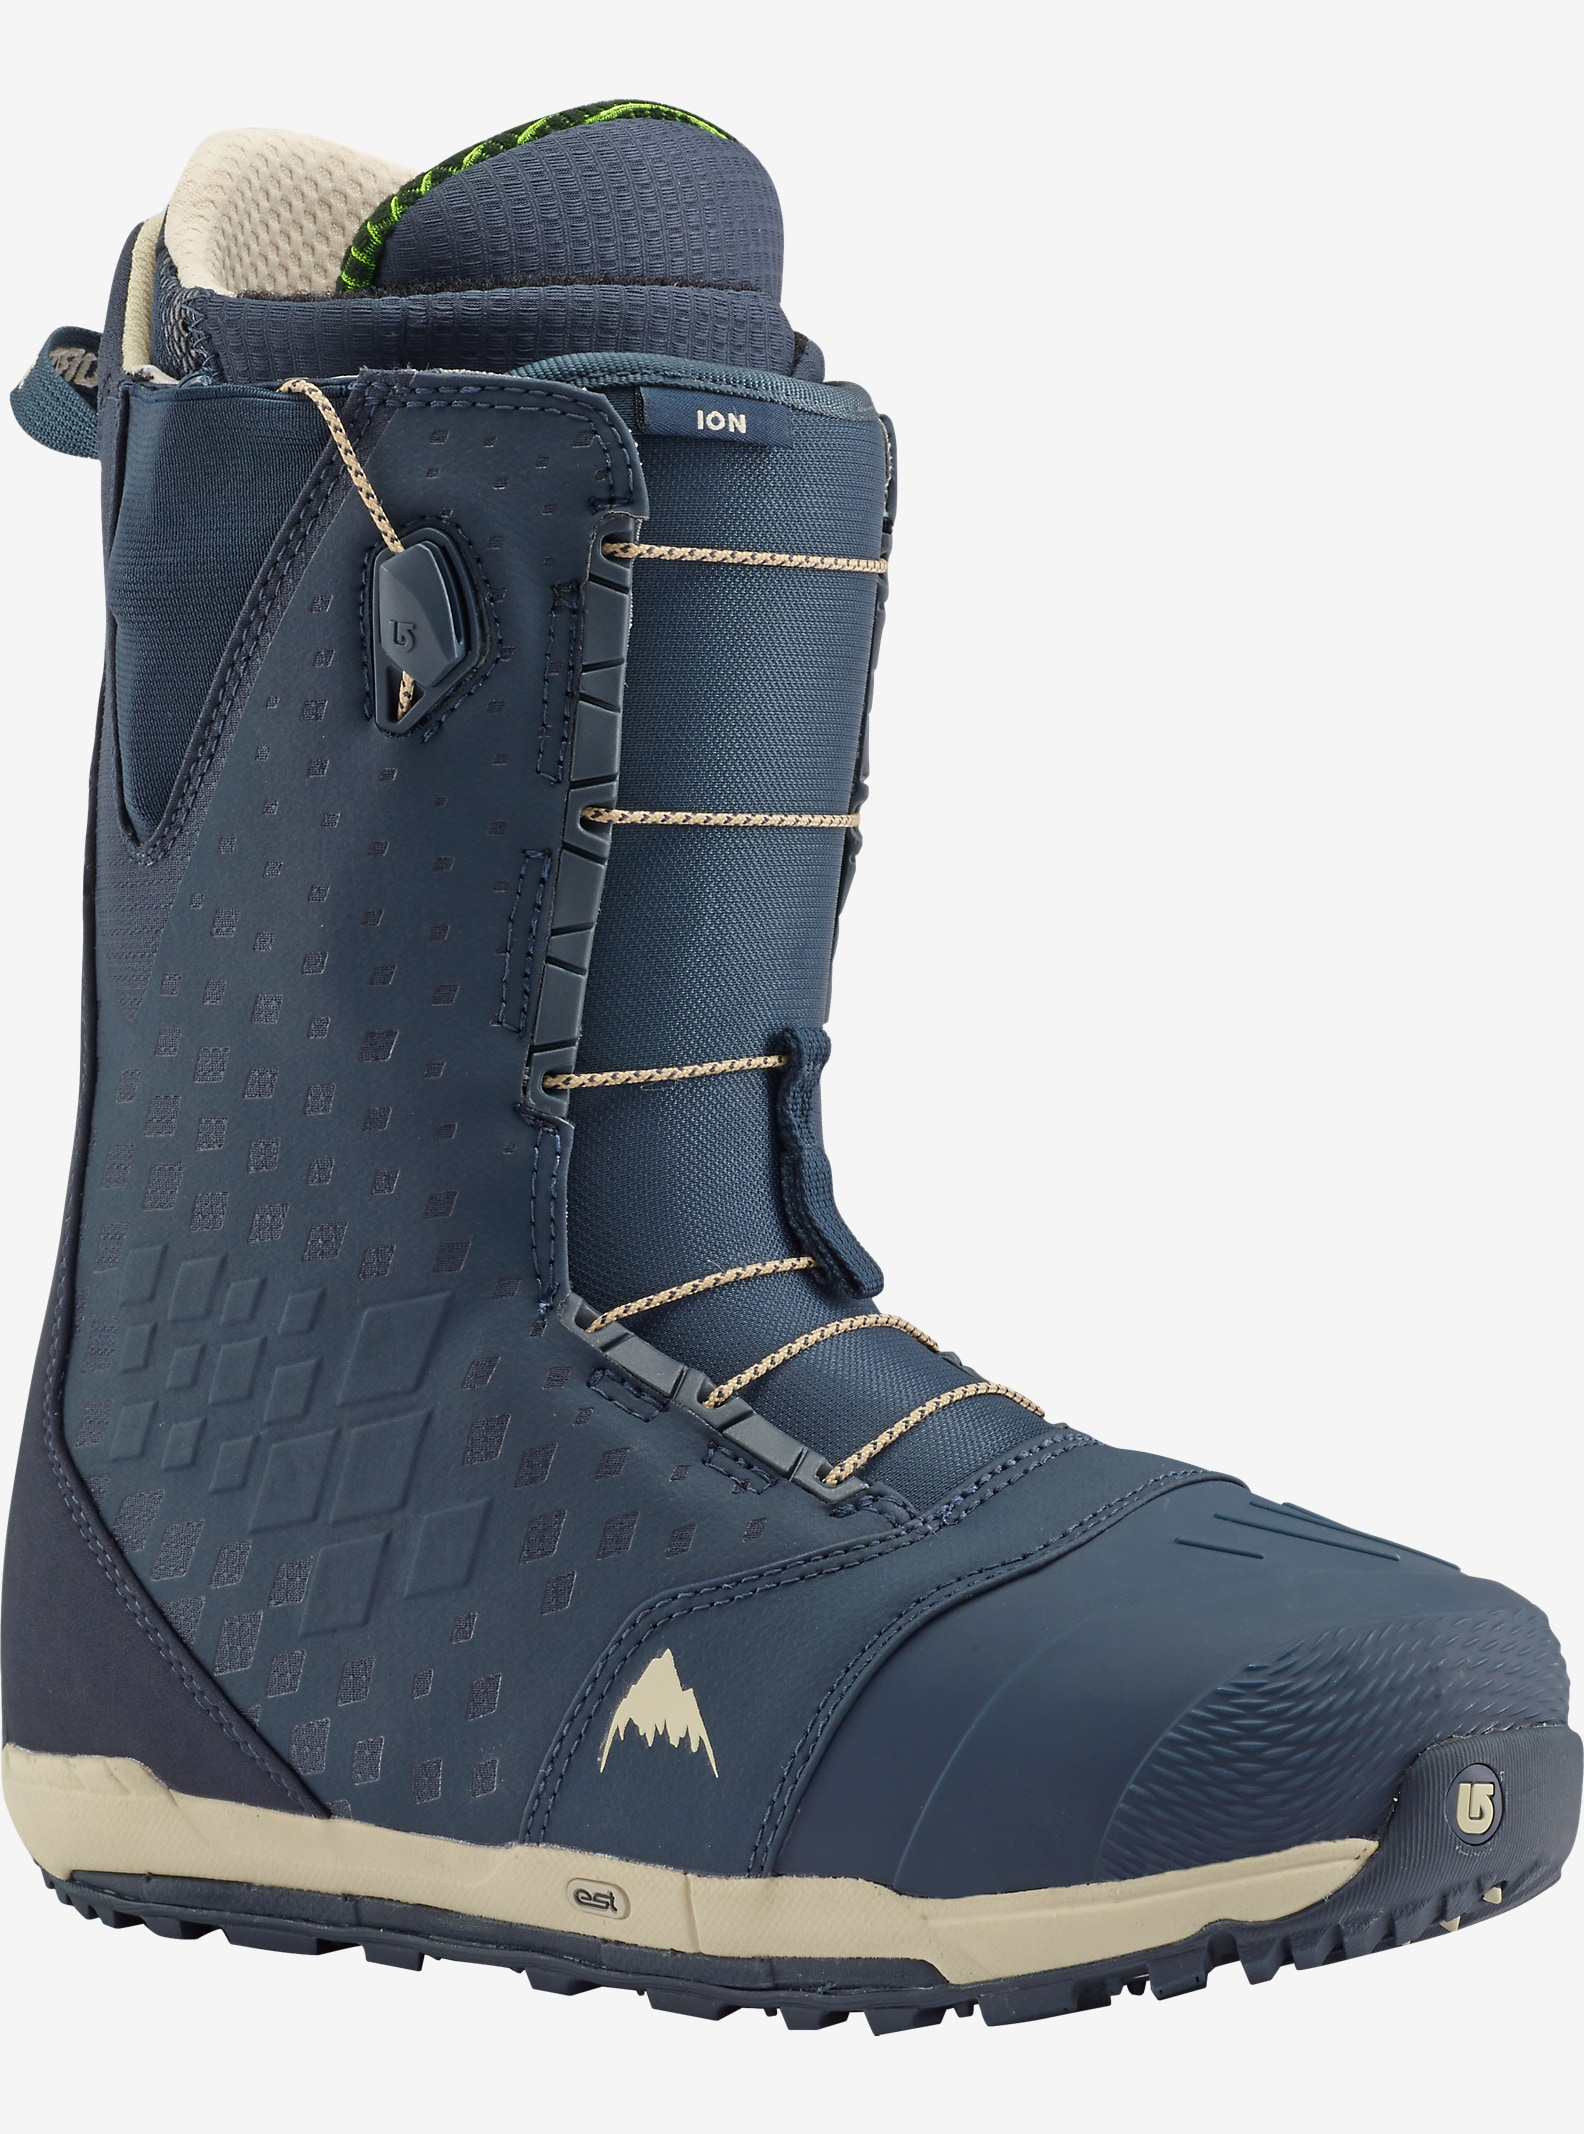 Burton Ion Snowboard Boot shown in Blue